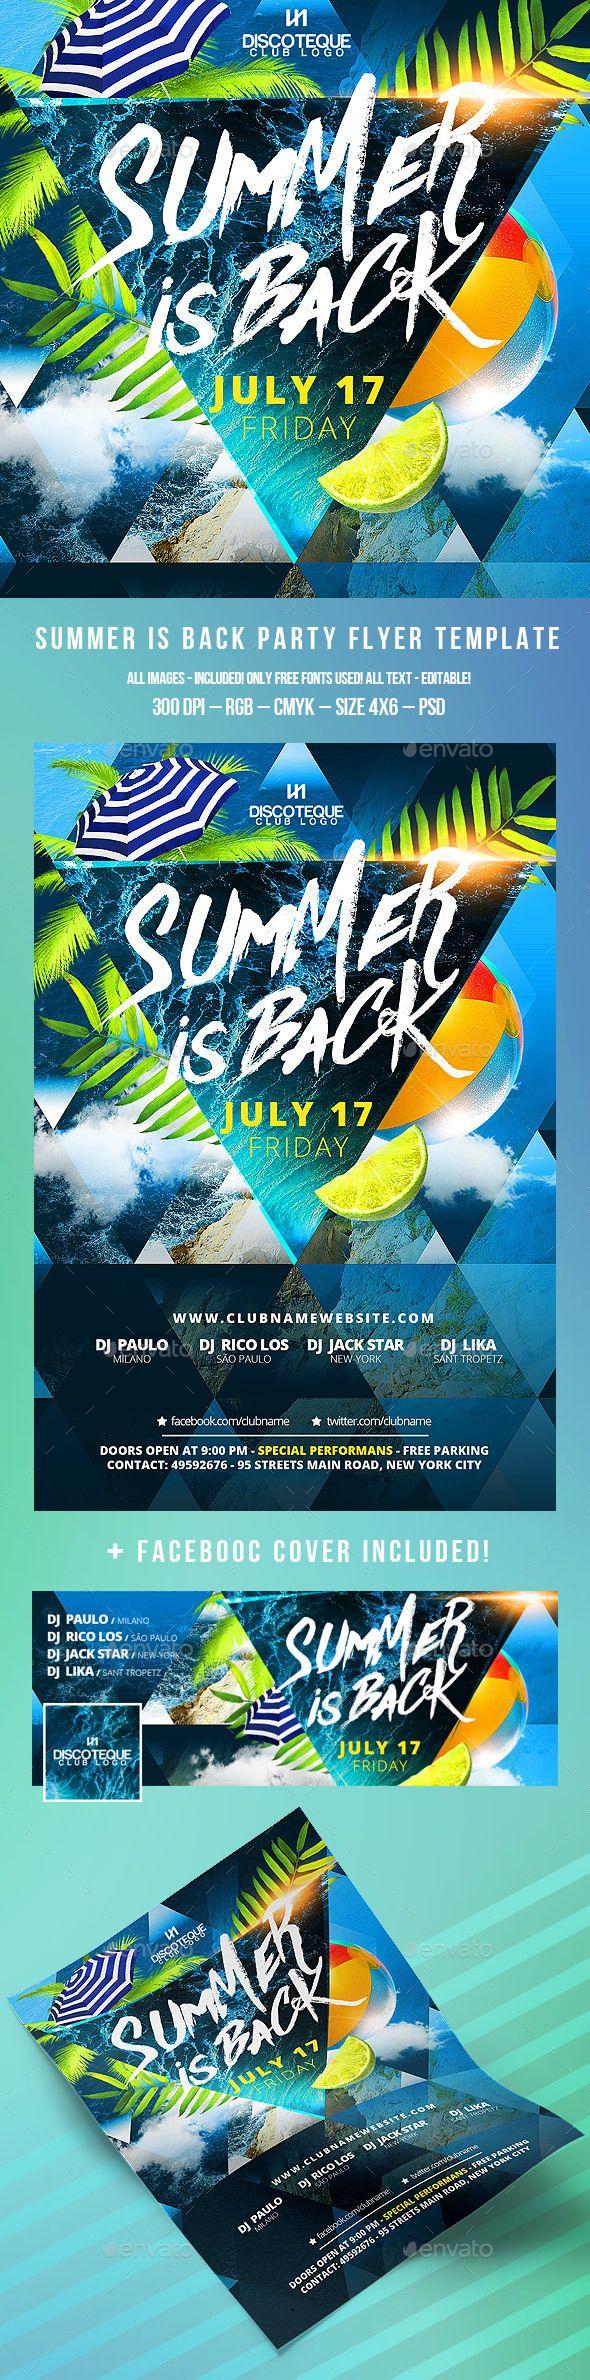 Summer Flyer Template PSD. Download here: http://graphicriver.net/item/summer-flyer/15418039?ref=ksioks